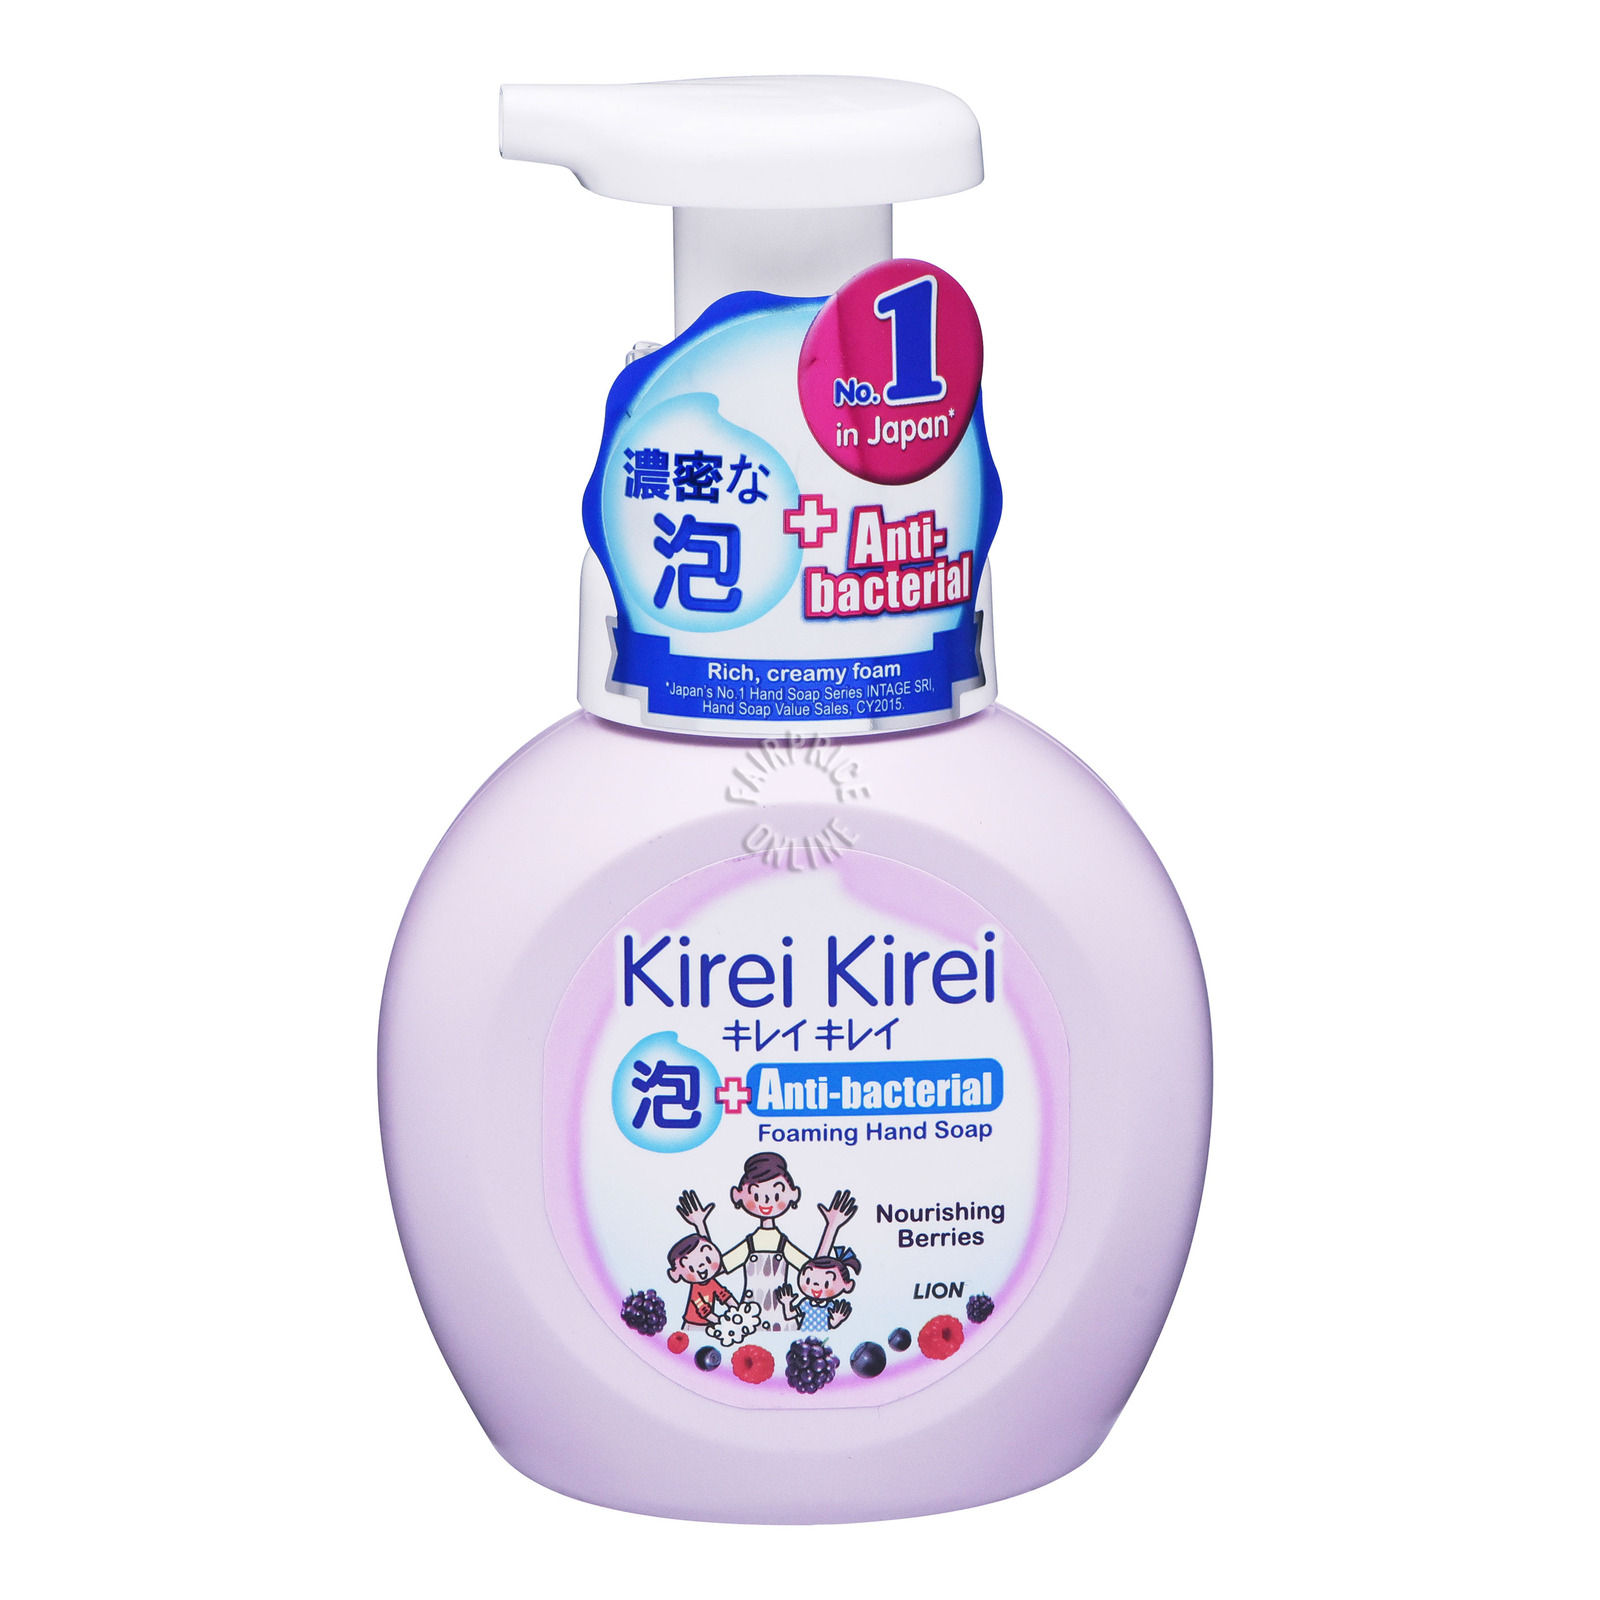 Kirei Kirei Anti-bacterial Hand Soap - Nourishing Berries